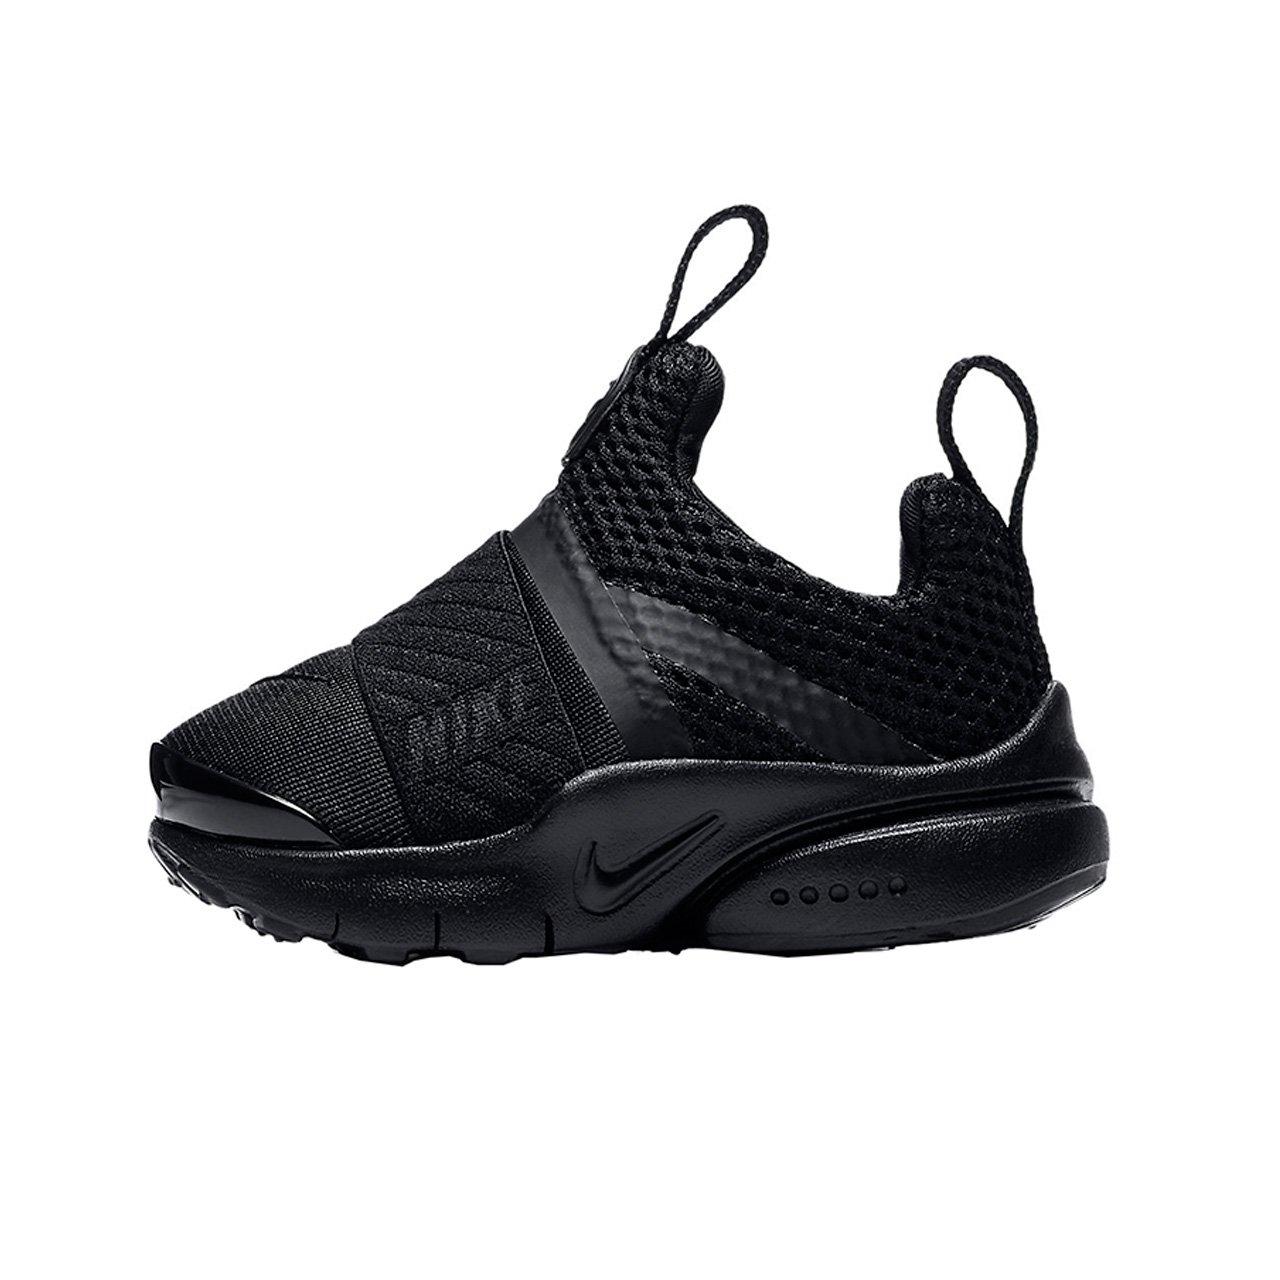 Nike Boy's Presto Extreme Toddler Shoe, Black/Black, 9C